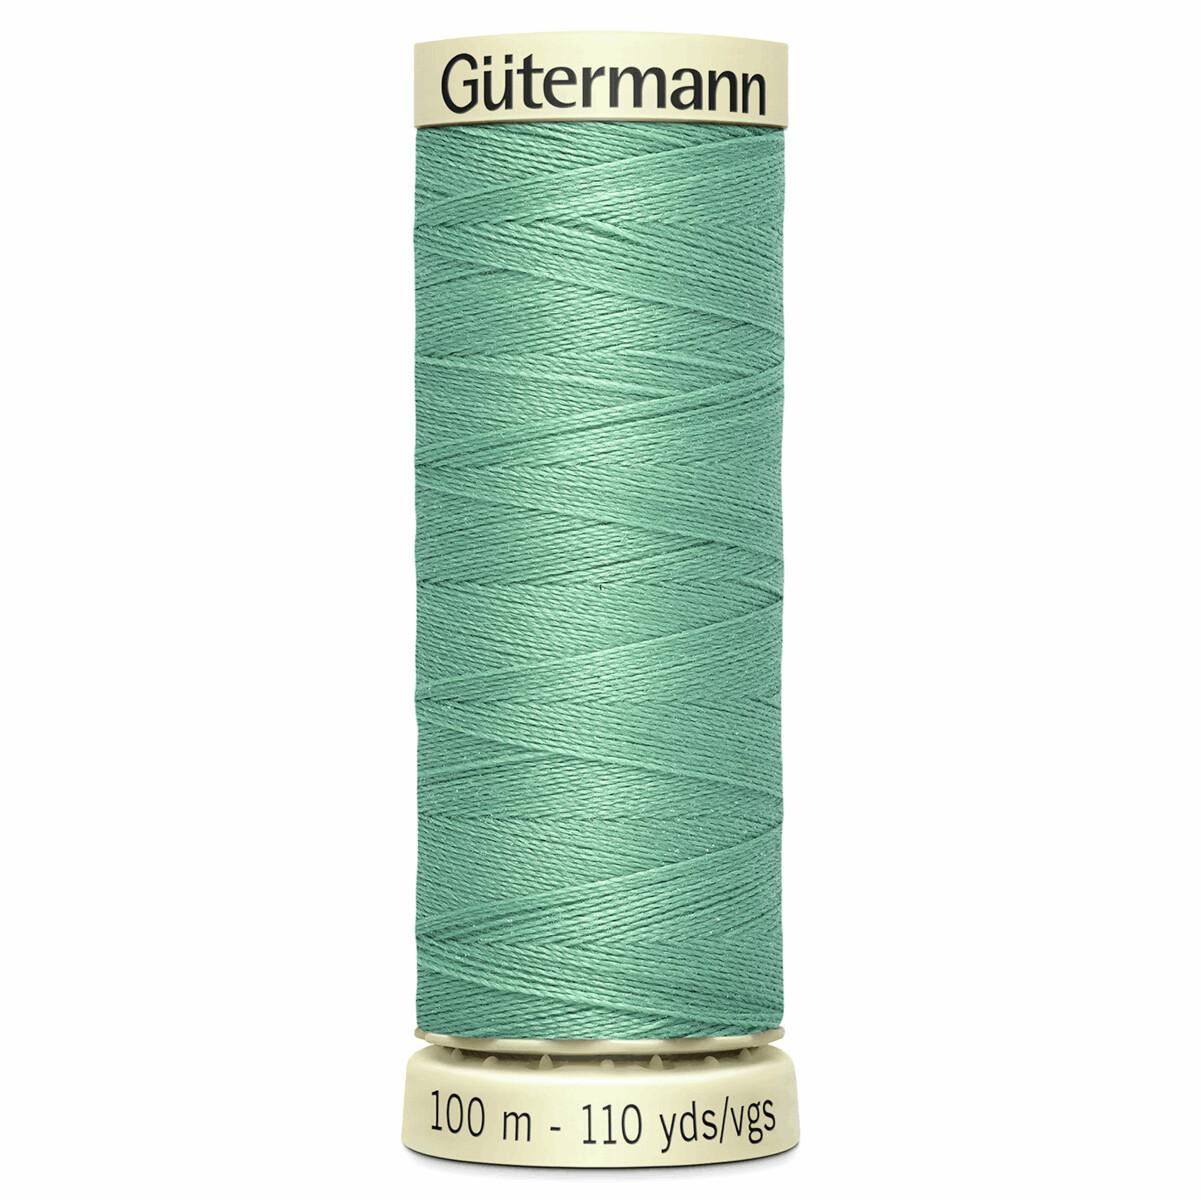 Gutermann Sew-All thread 100